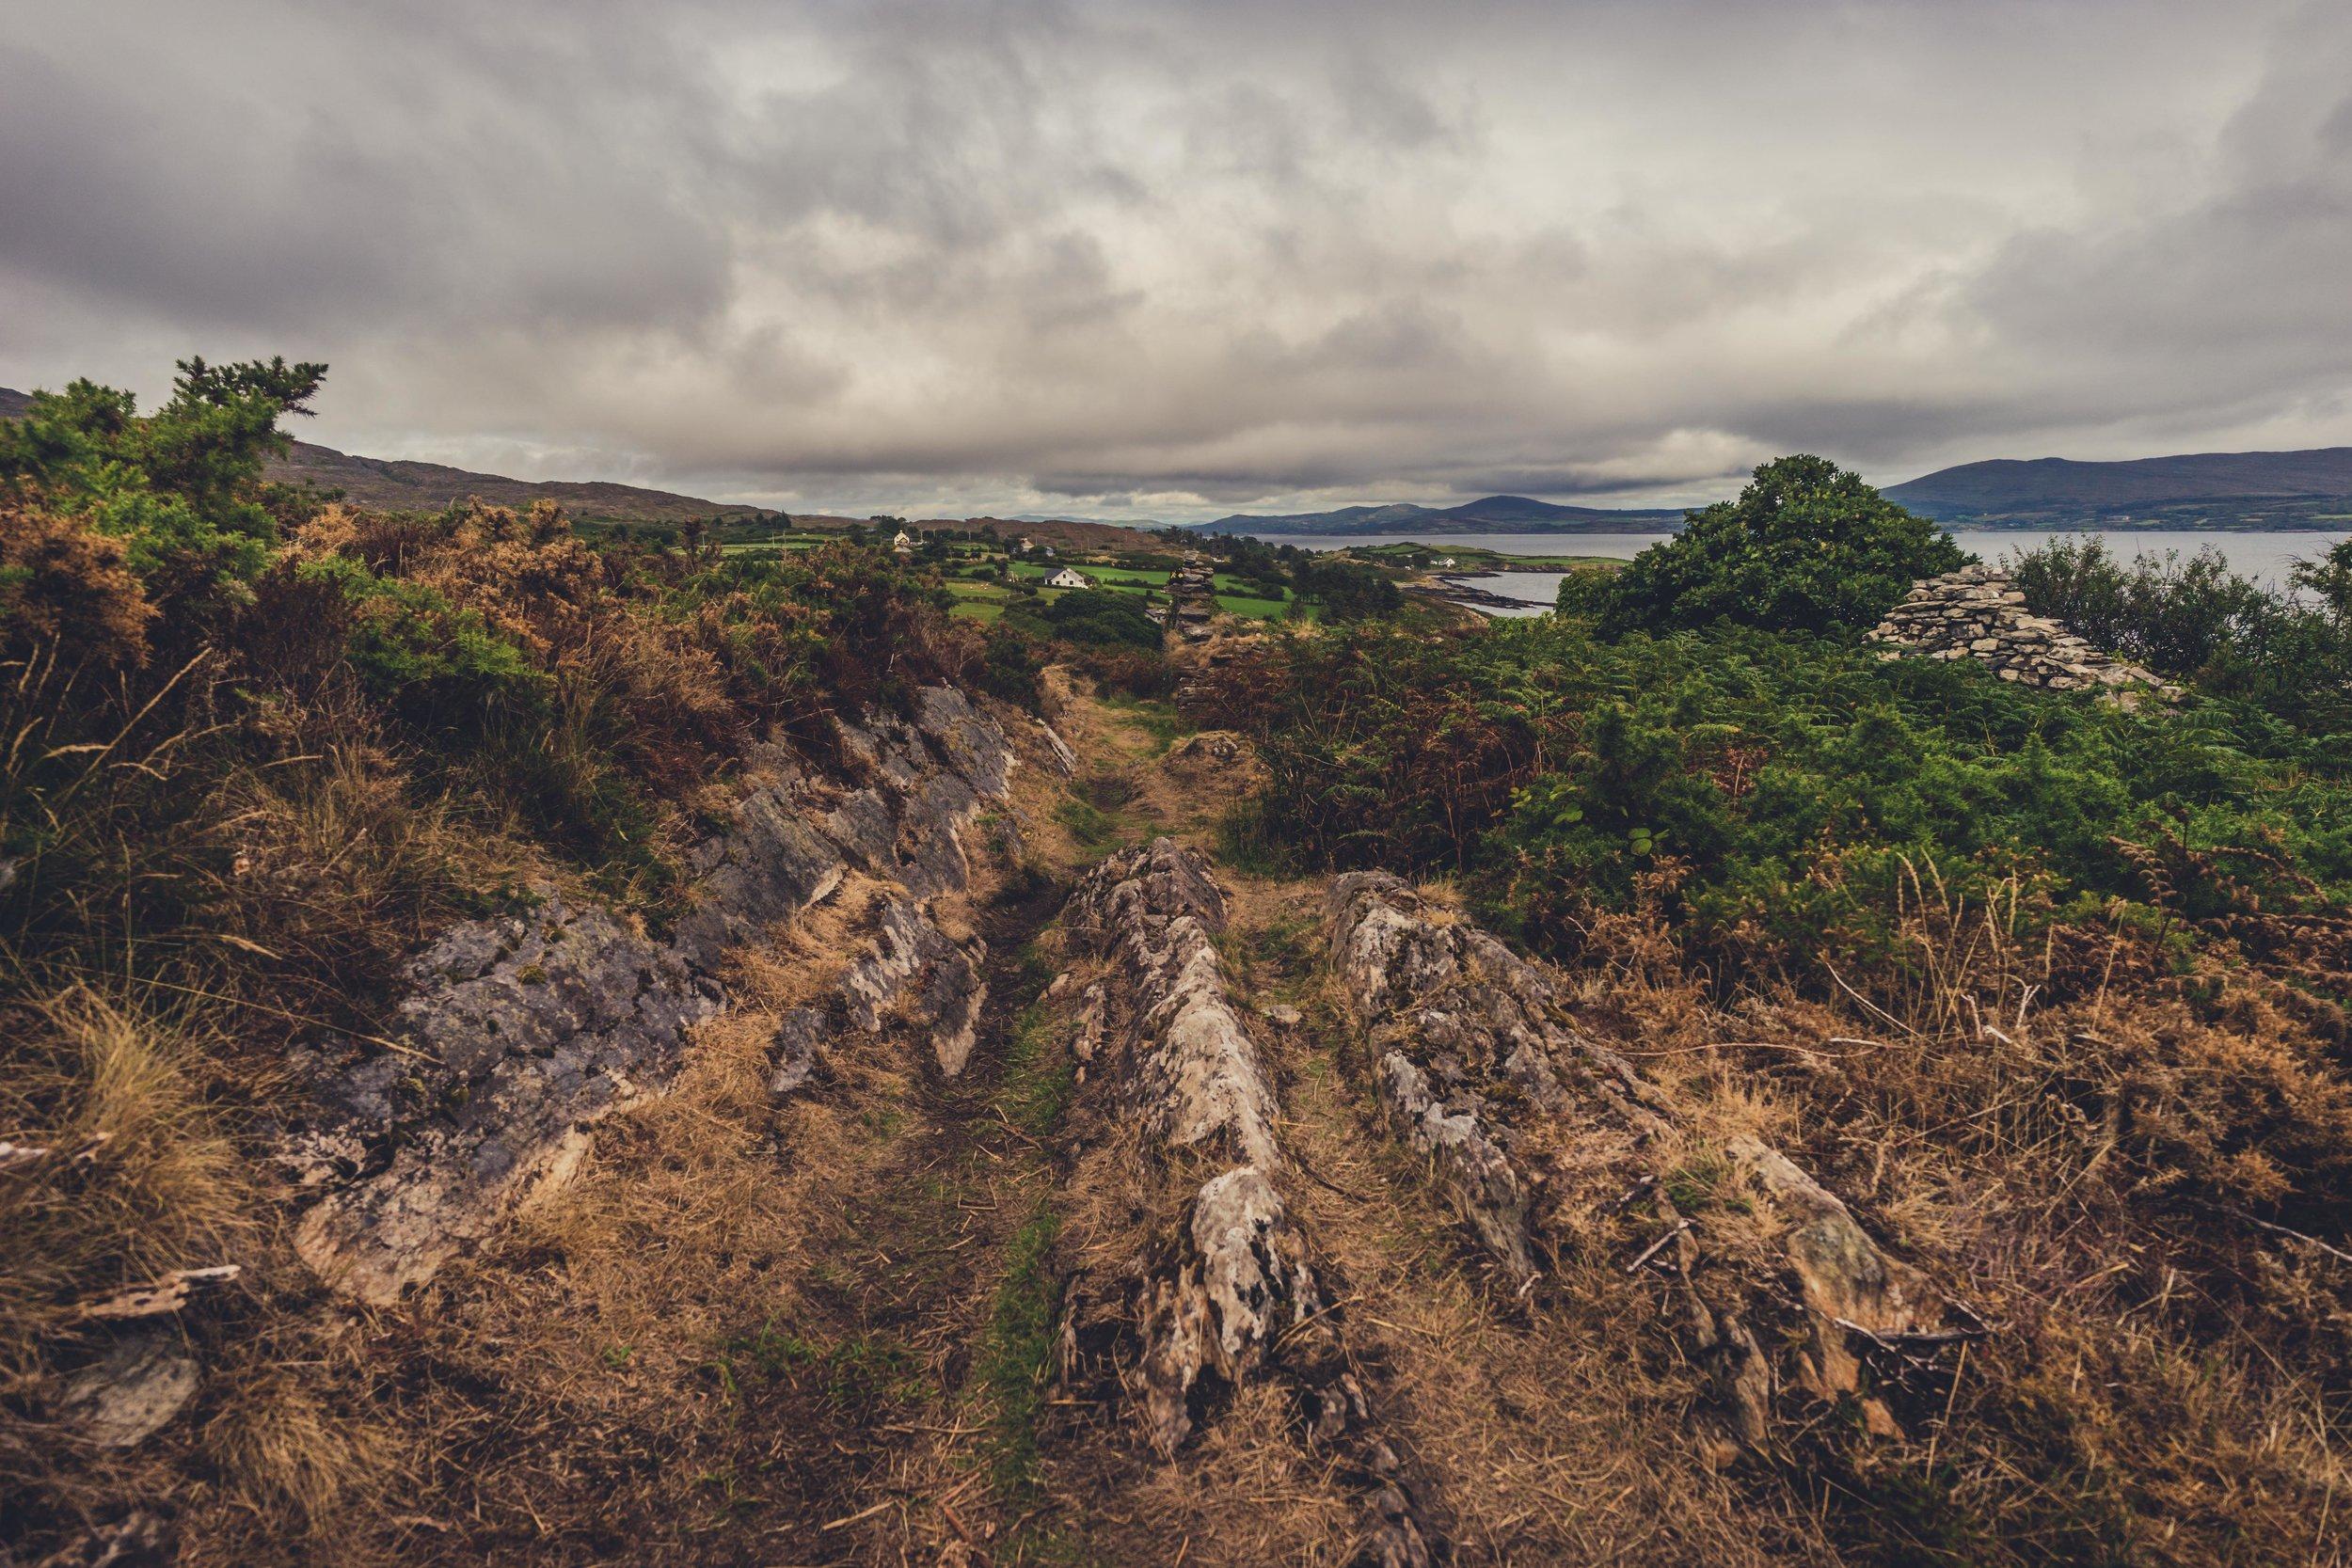 county cork. cork. ireland. irish. history. city. house sitting. old. travel. travel photography. travel photographer. lough hyne. hiking. outdoor. adventure. hiking. camping. stormy weather.jpg